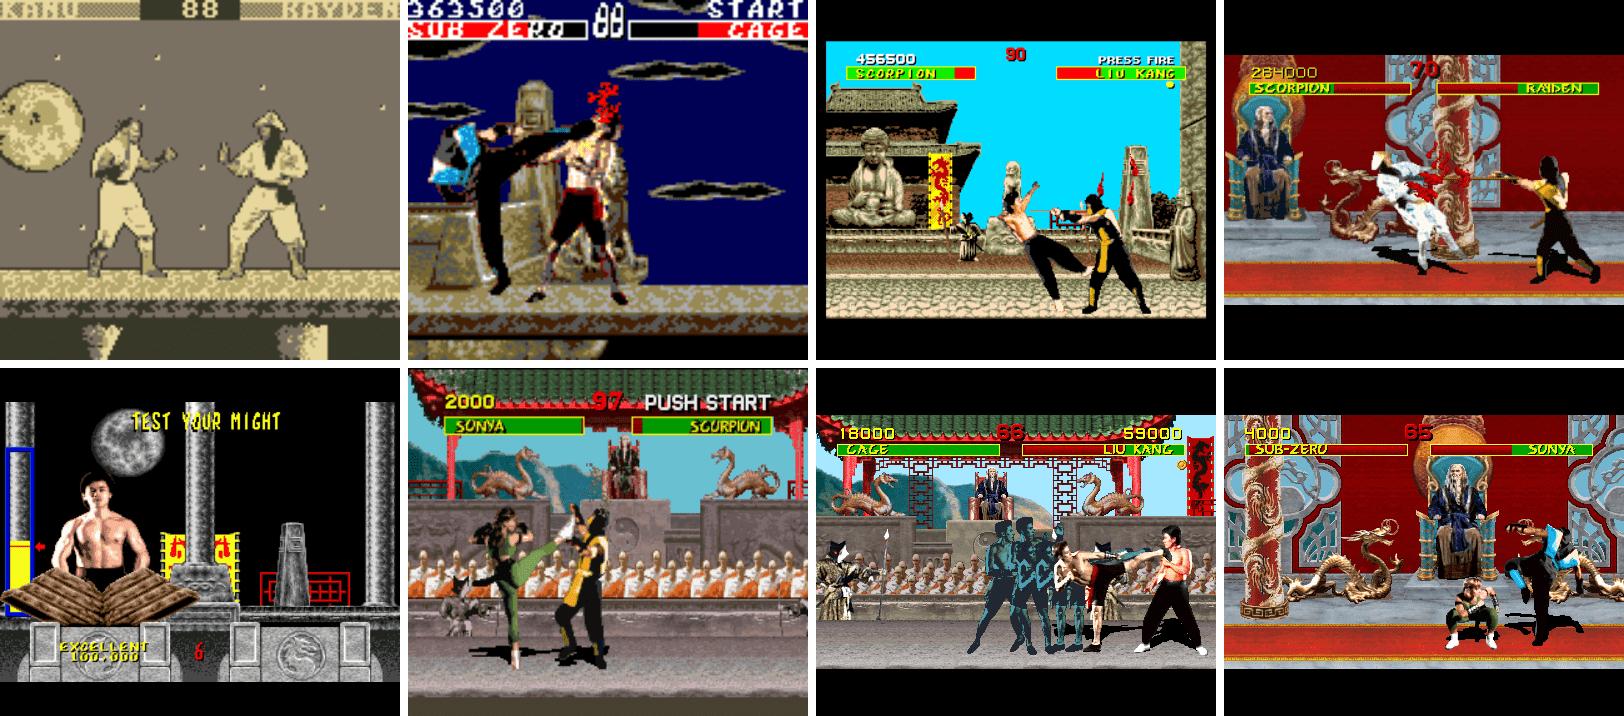 Image For Post | game boy - game gear - amiga - pc sega cd - snes - arcade x2